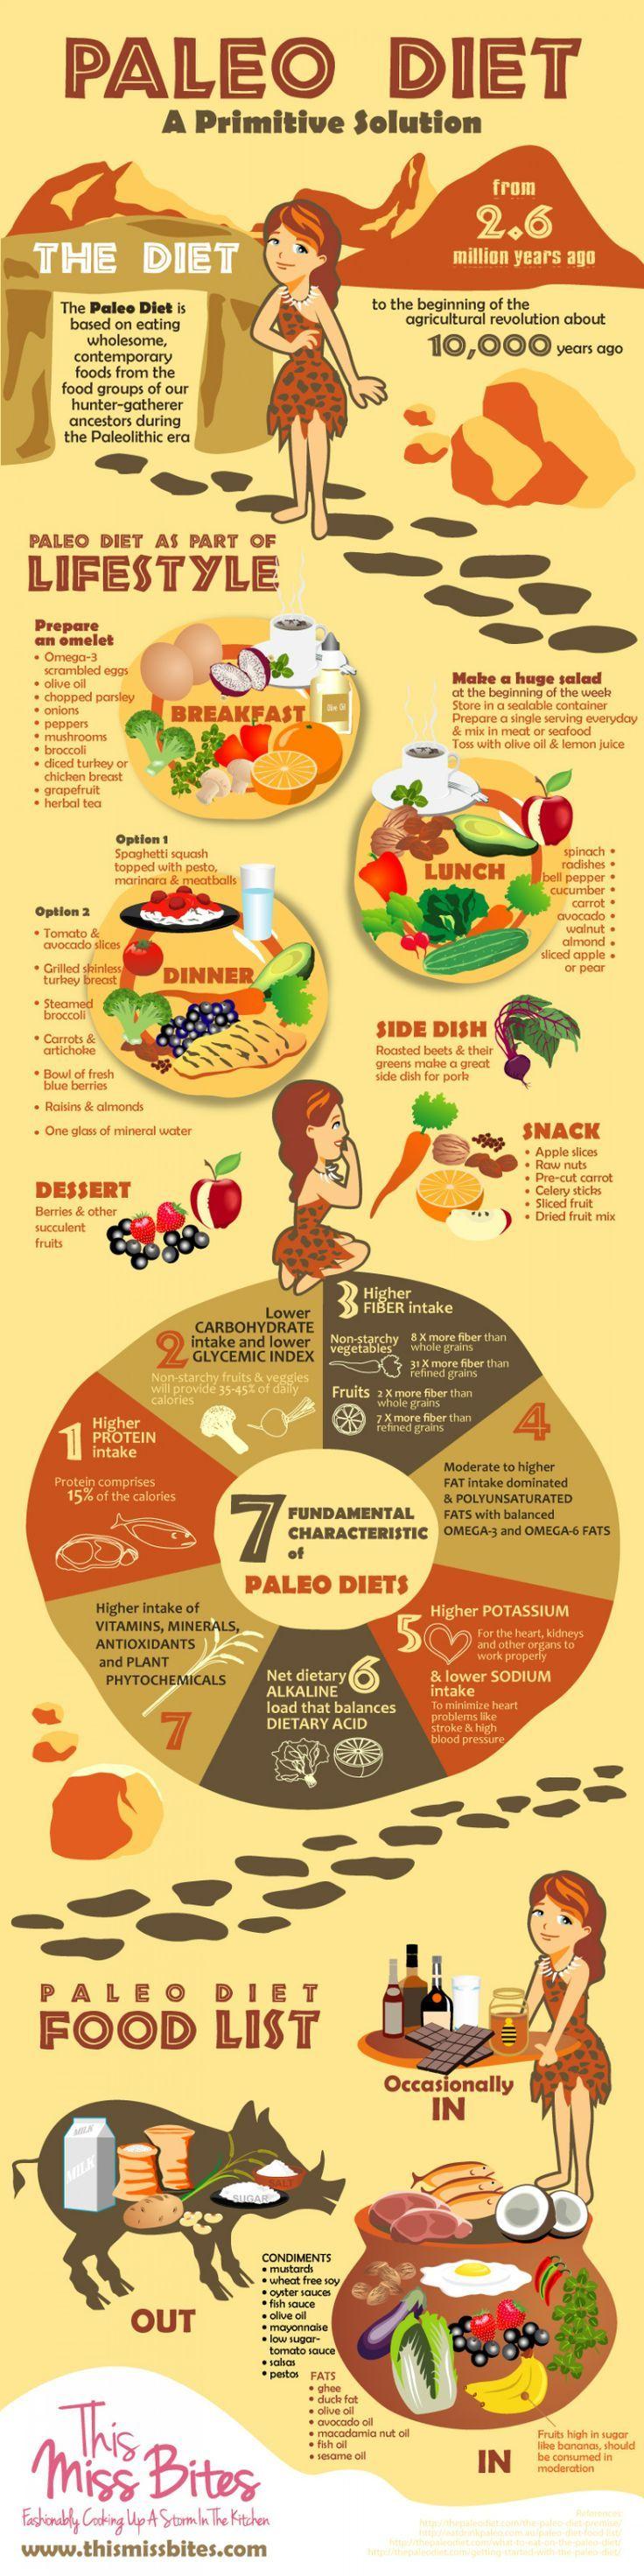 Oatmeal lose body fat